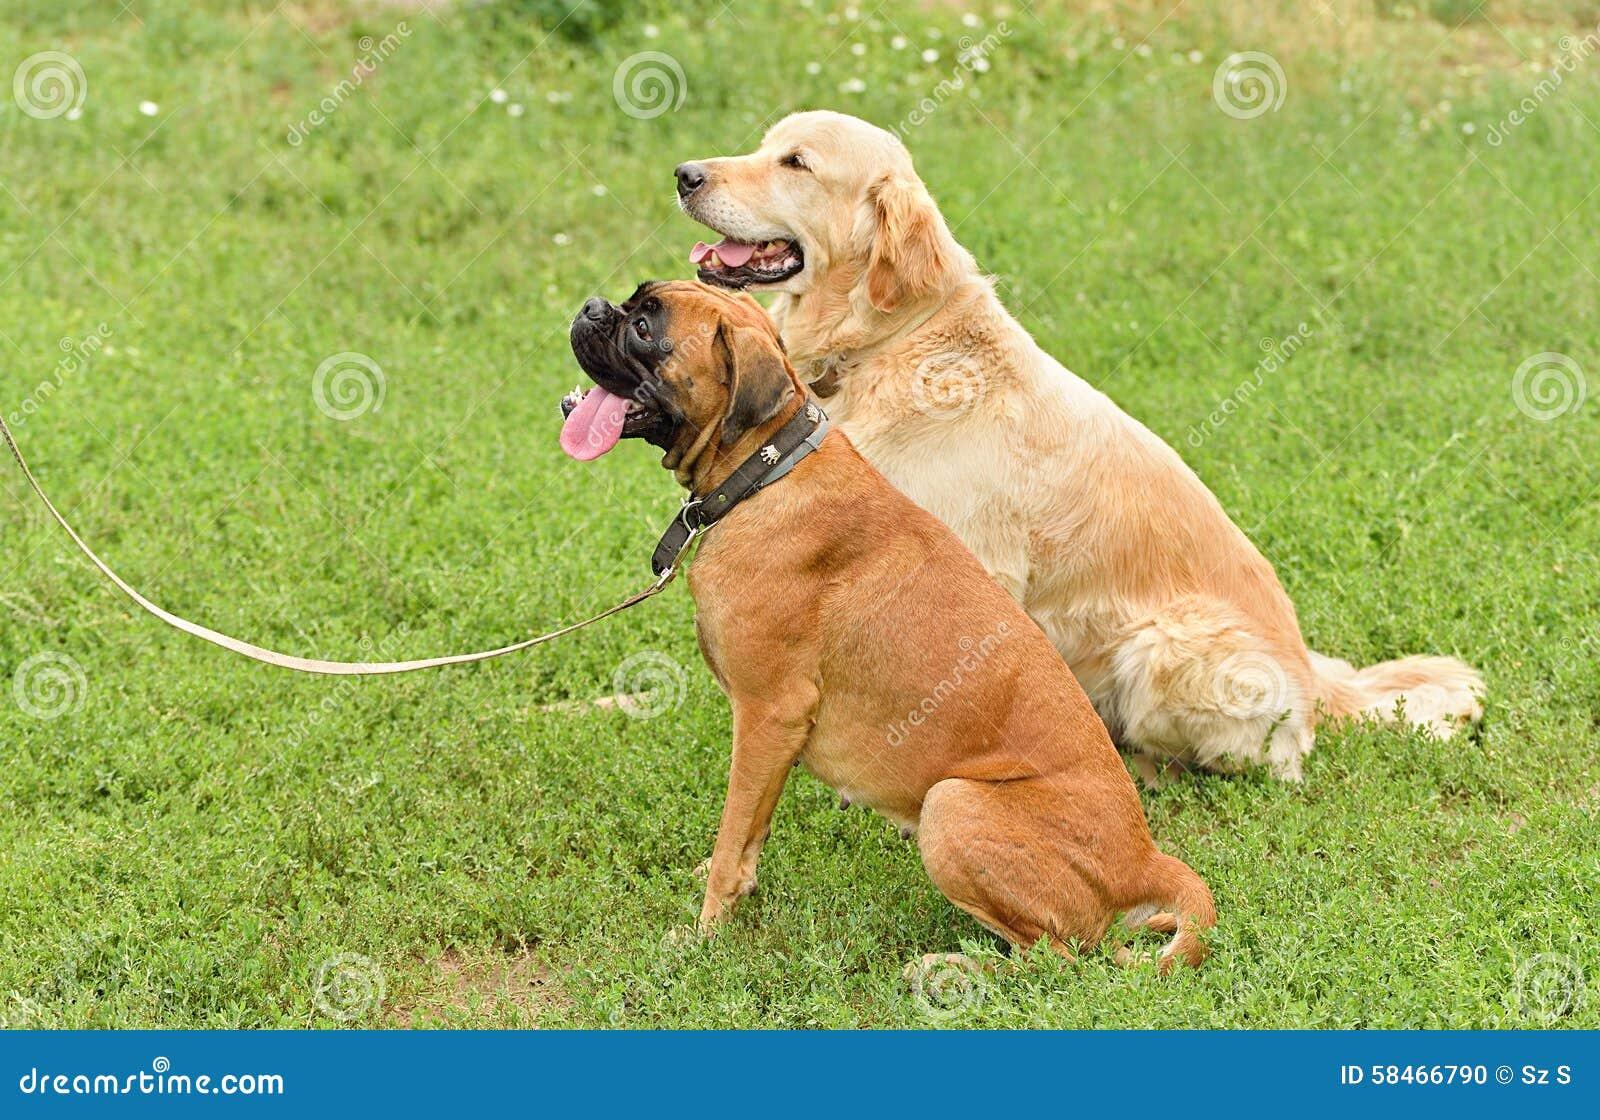 Boxer And Golden Retriever Portrait Stock Photo Image Of Calm